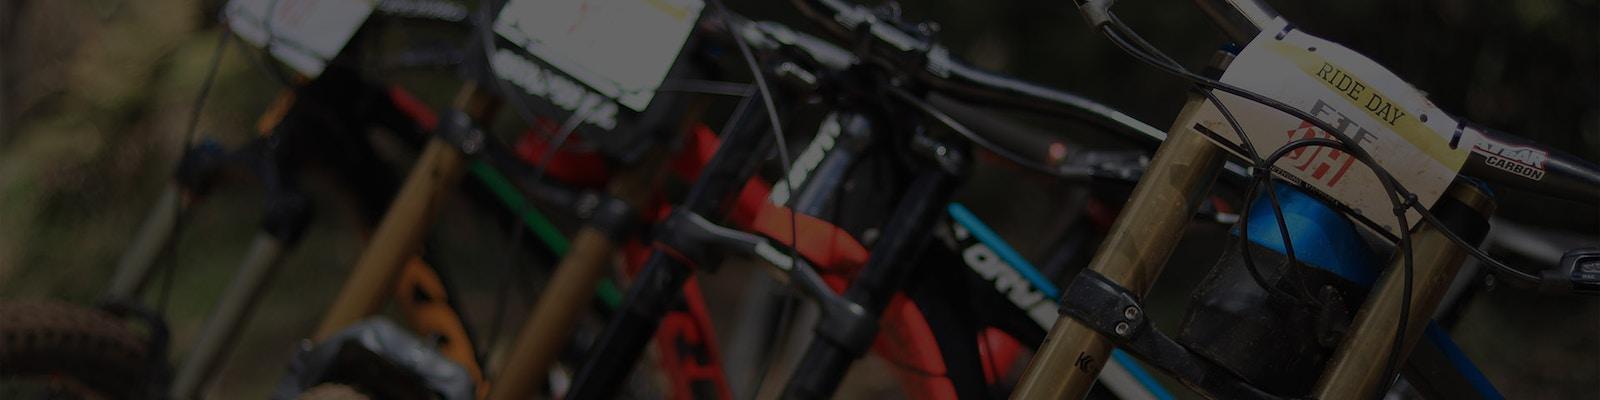 Banner - 2018 Kona Operator AL DL shock and cranks - Life of Bikes Pakenham